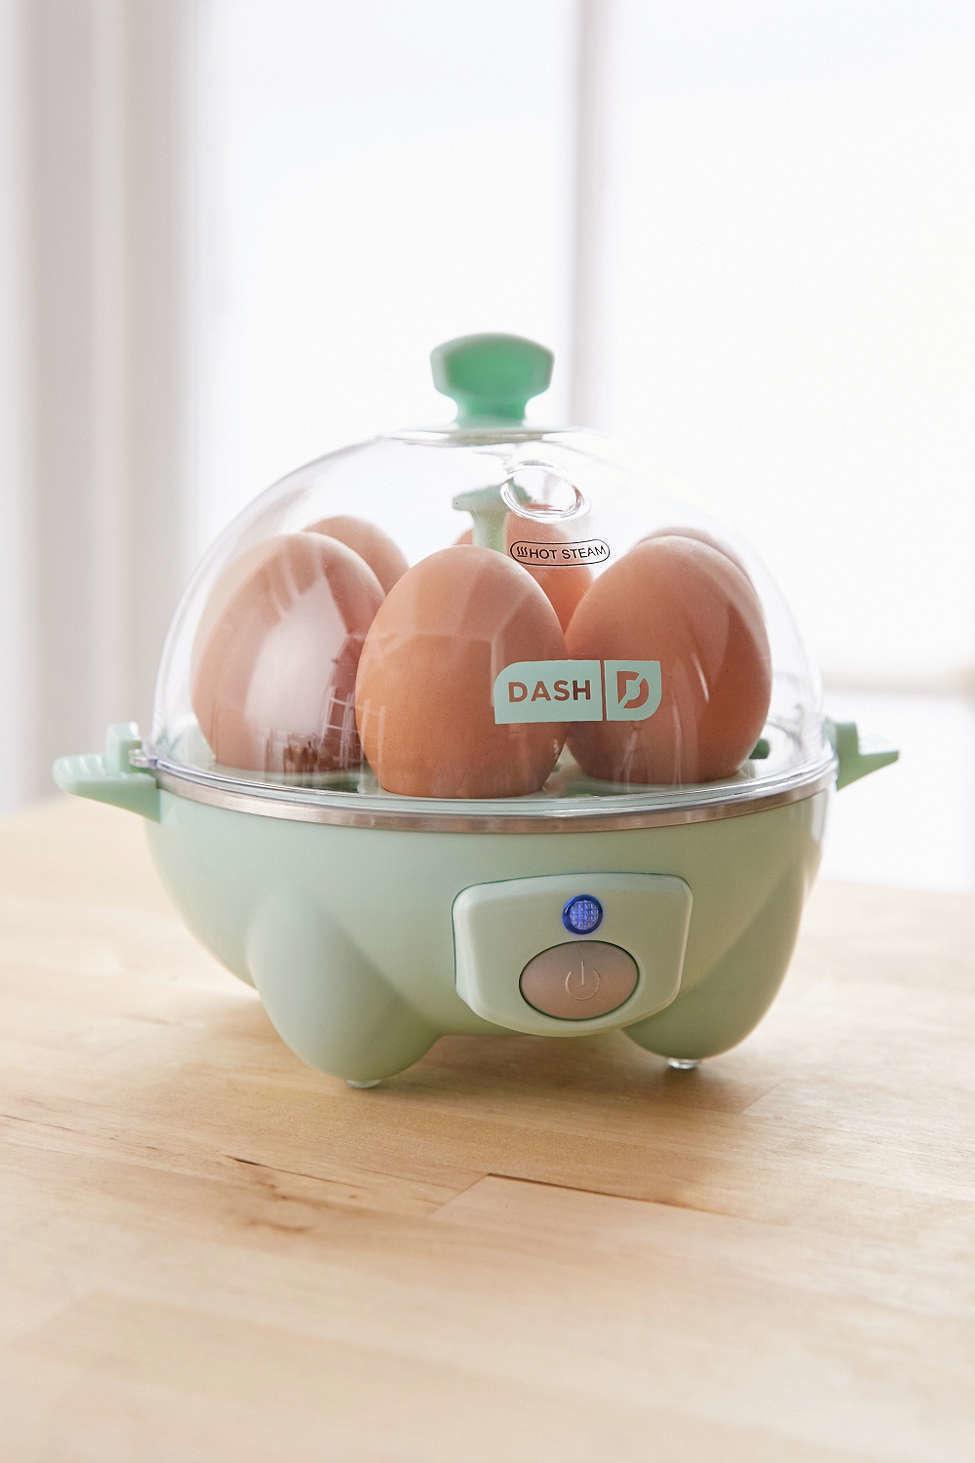 9. Яйцеварка. Варит яйца быстро и легко.